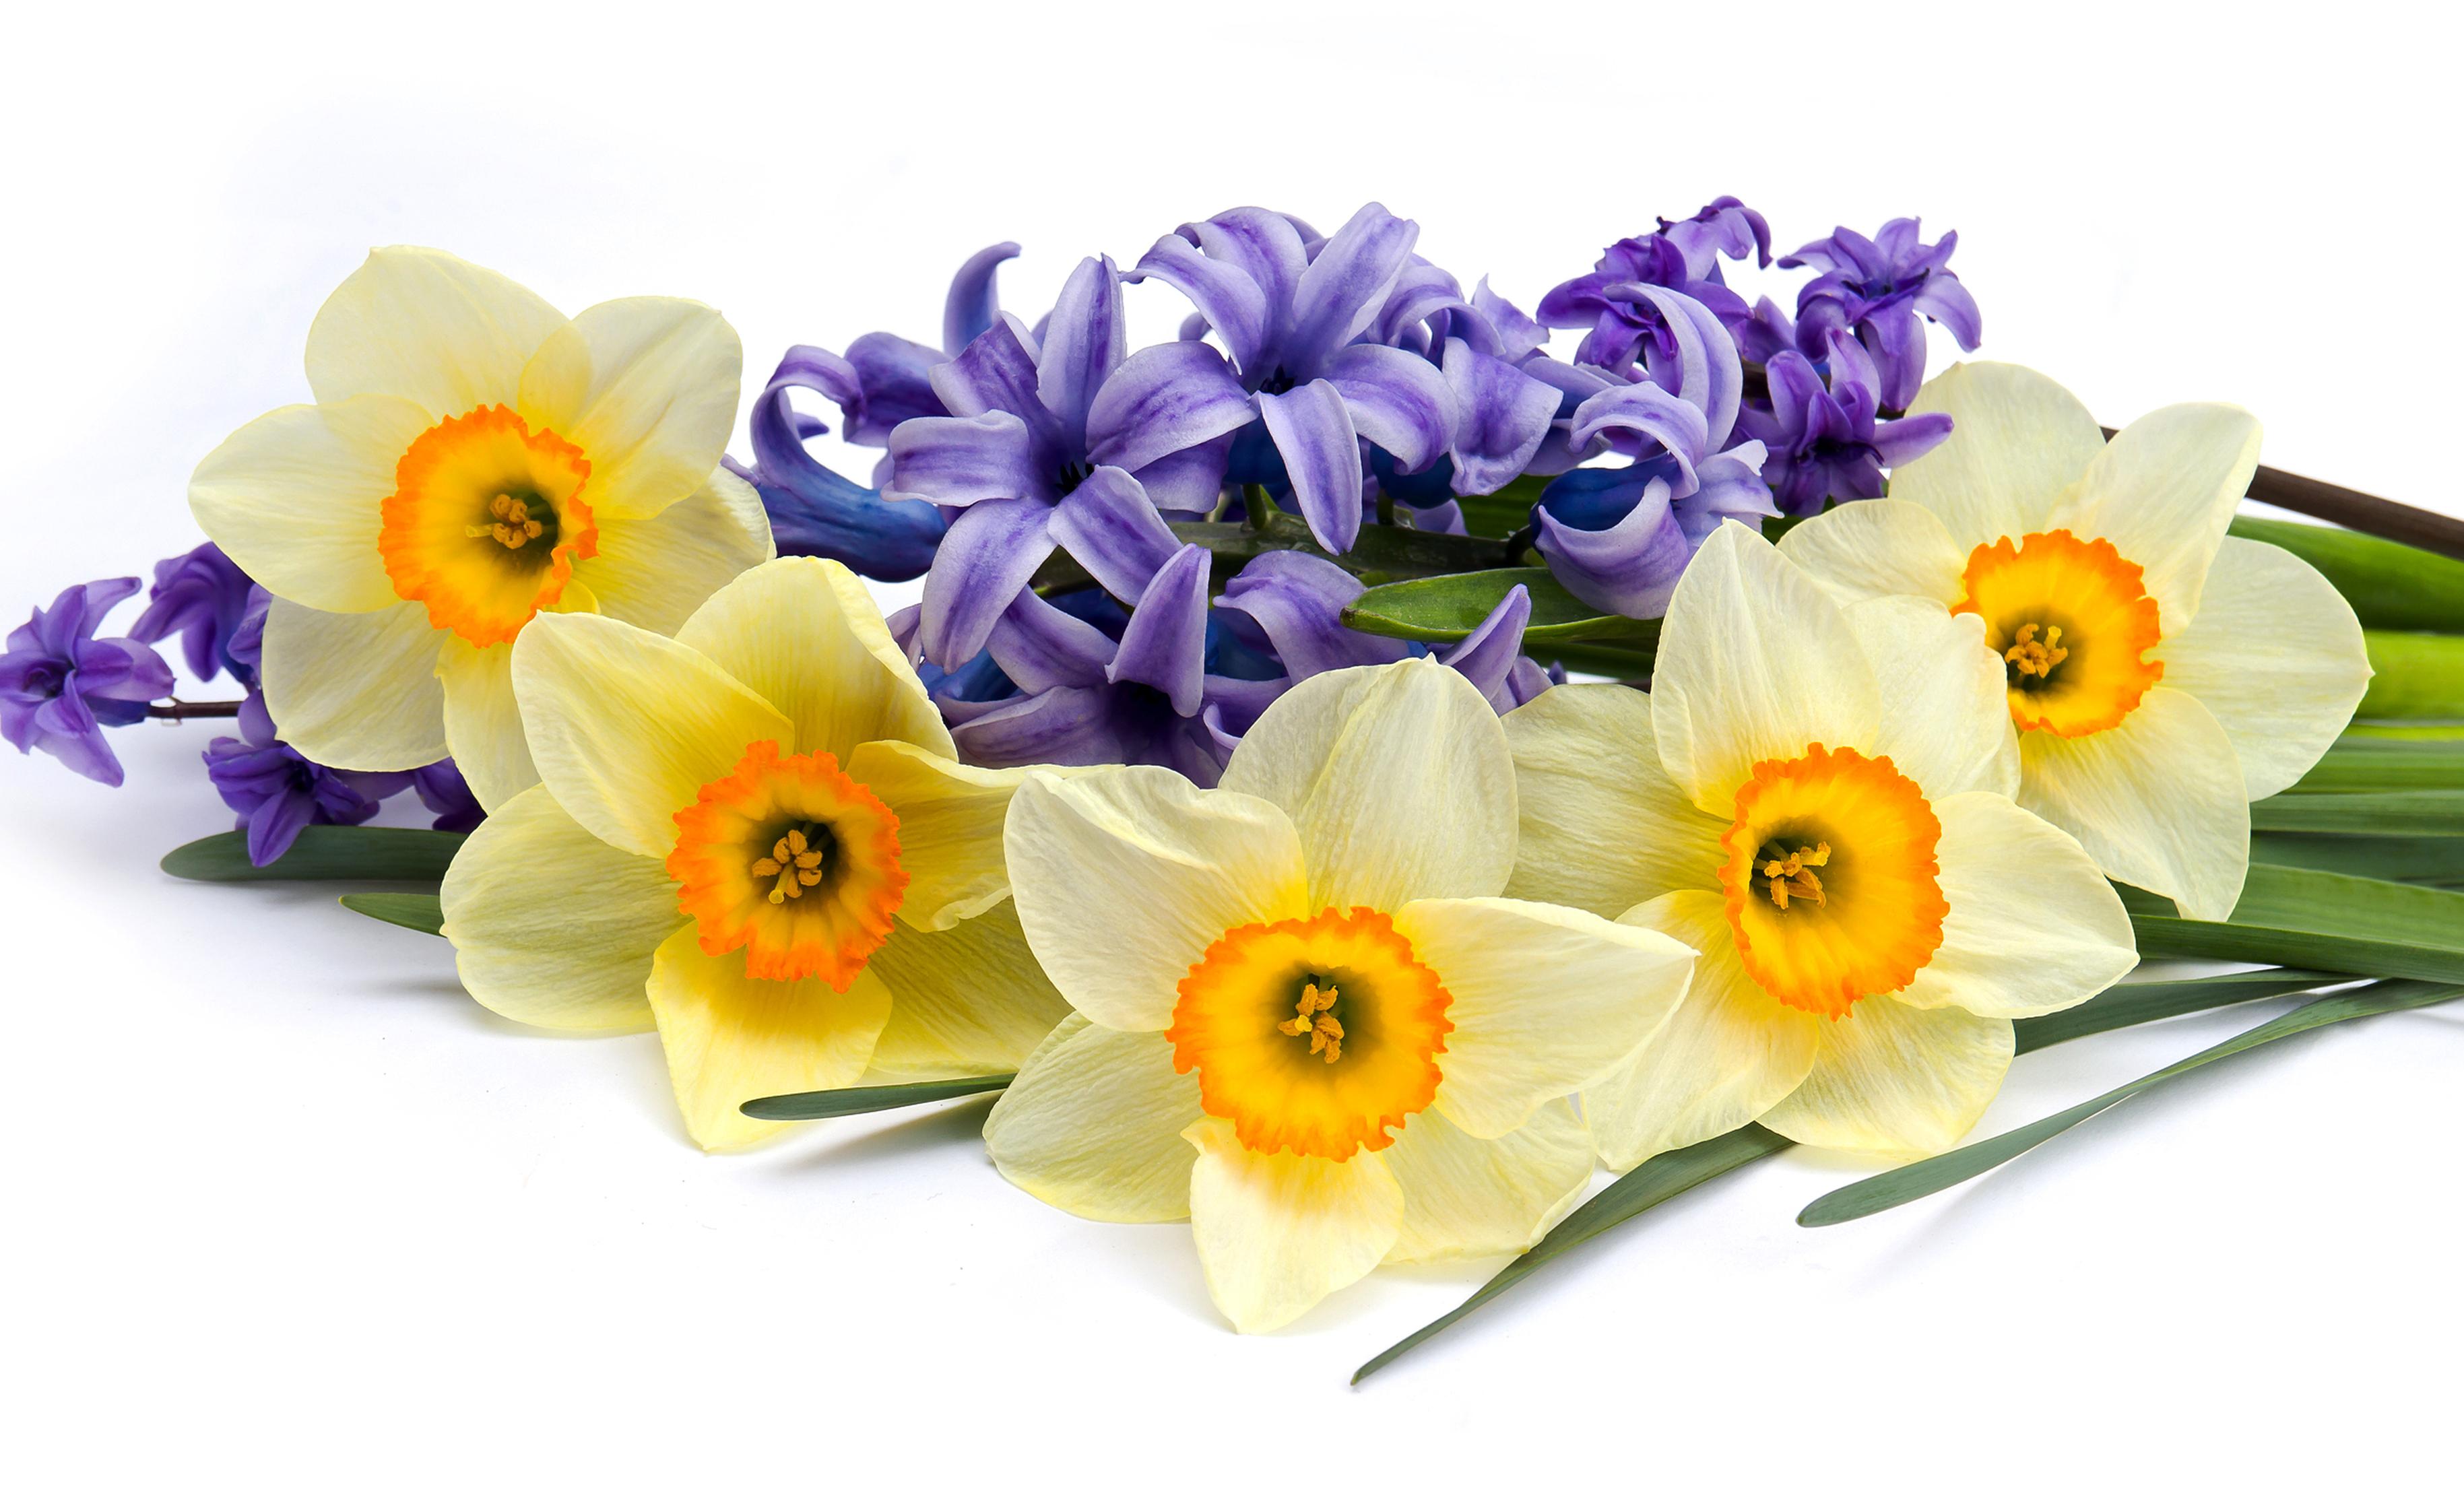 daffodils-photo-19